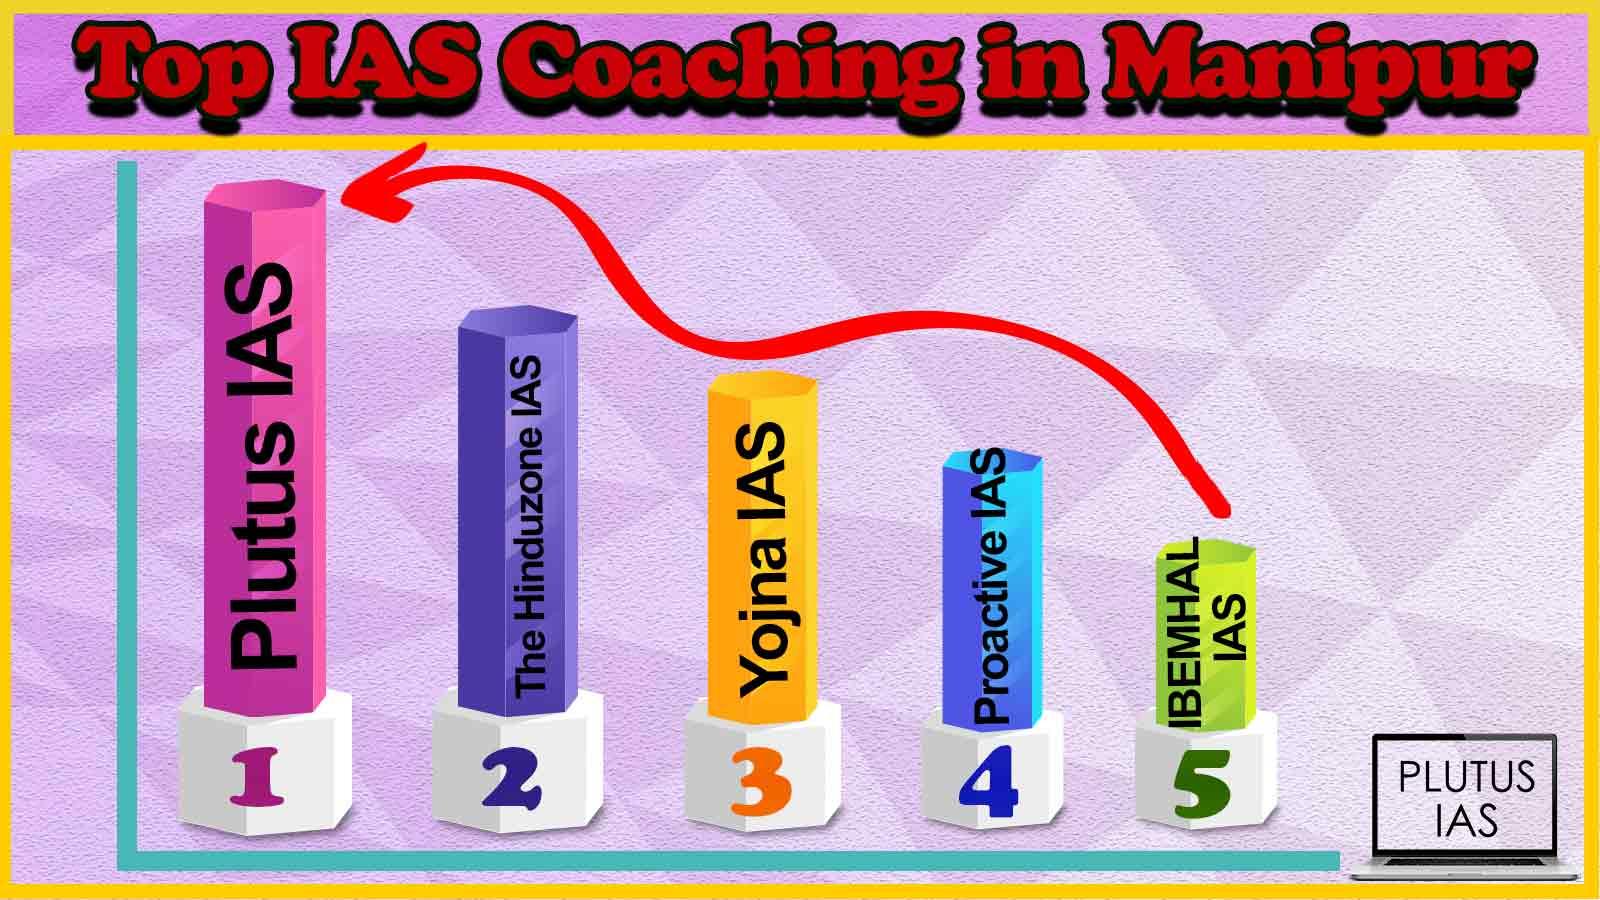 Top 10 IAS Coaching in Manipur